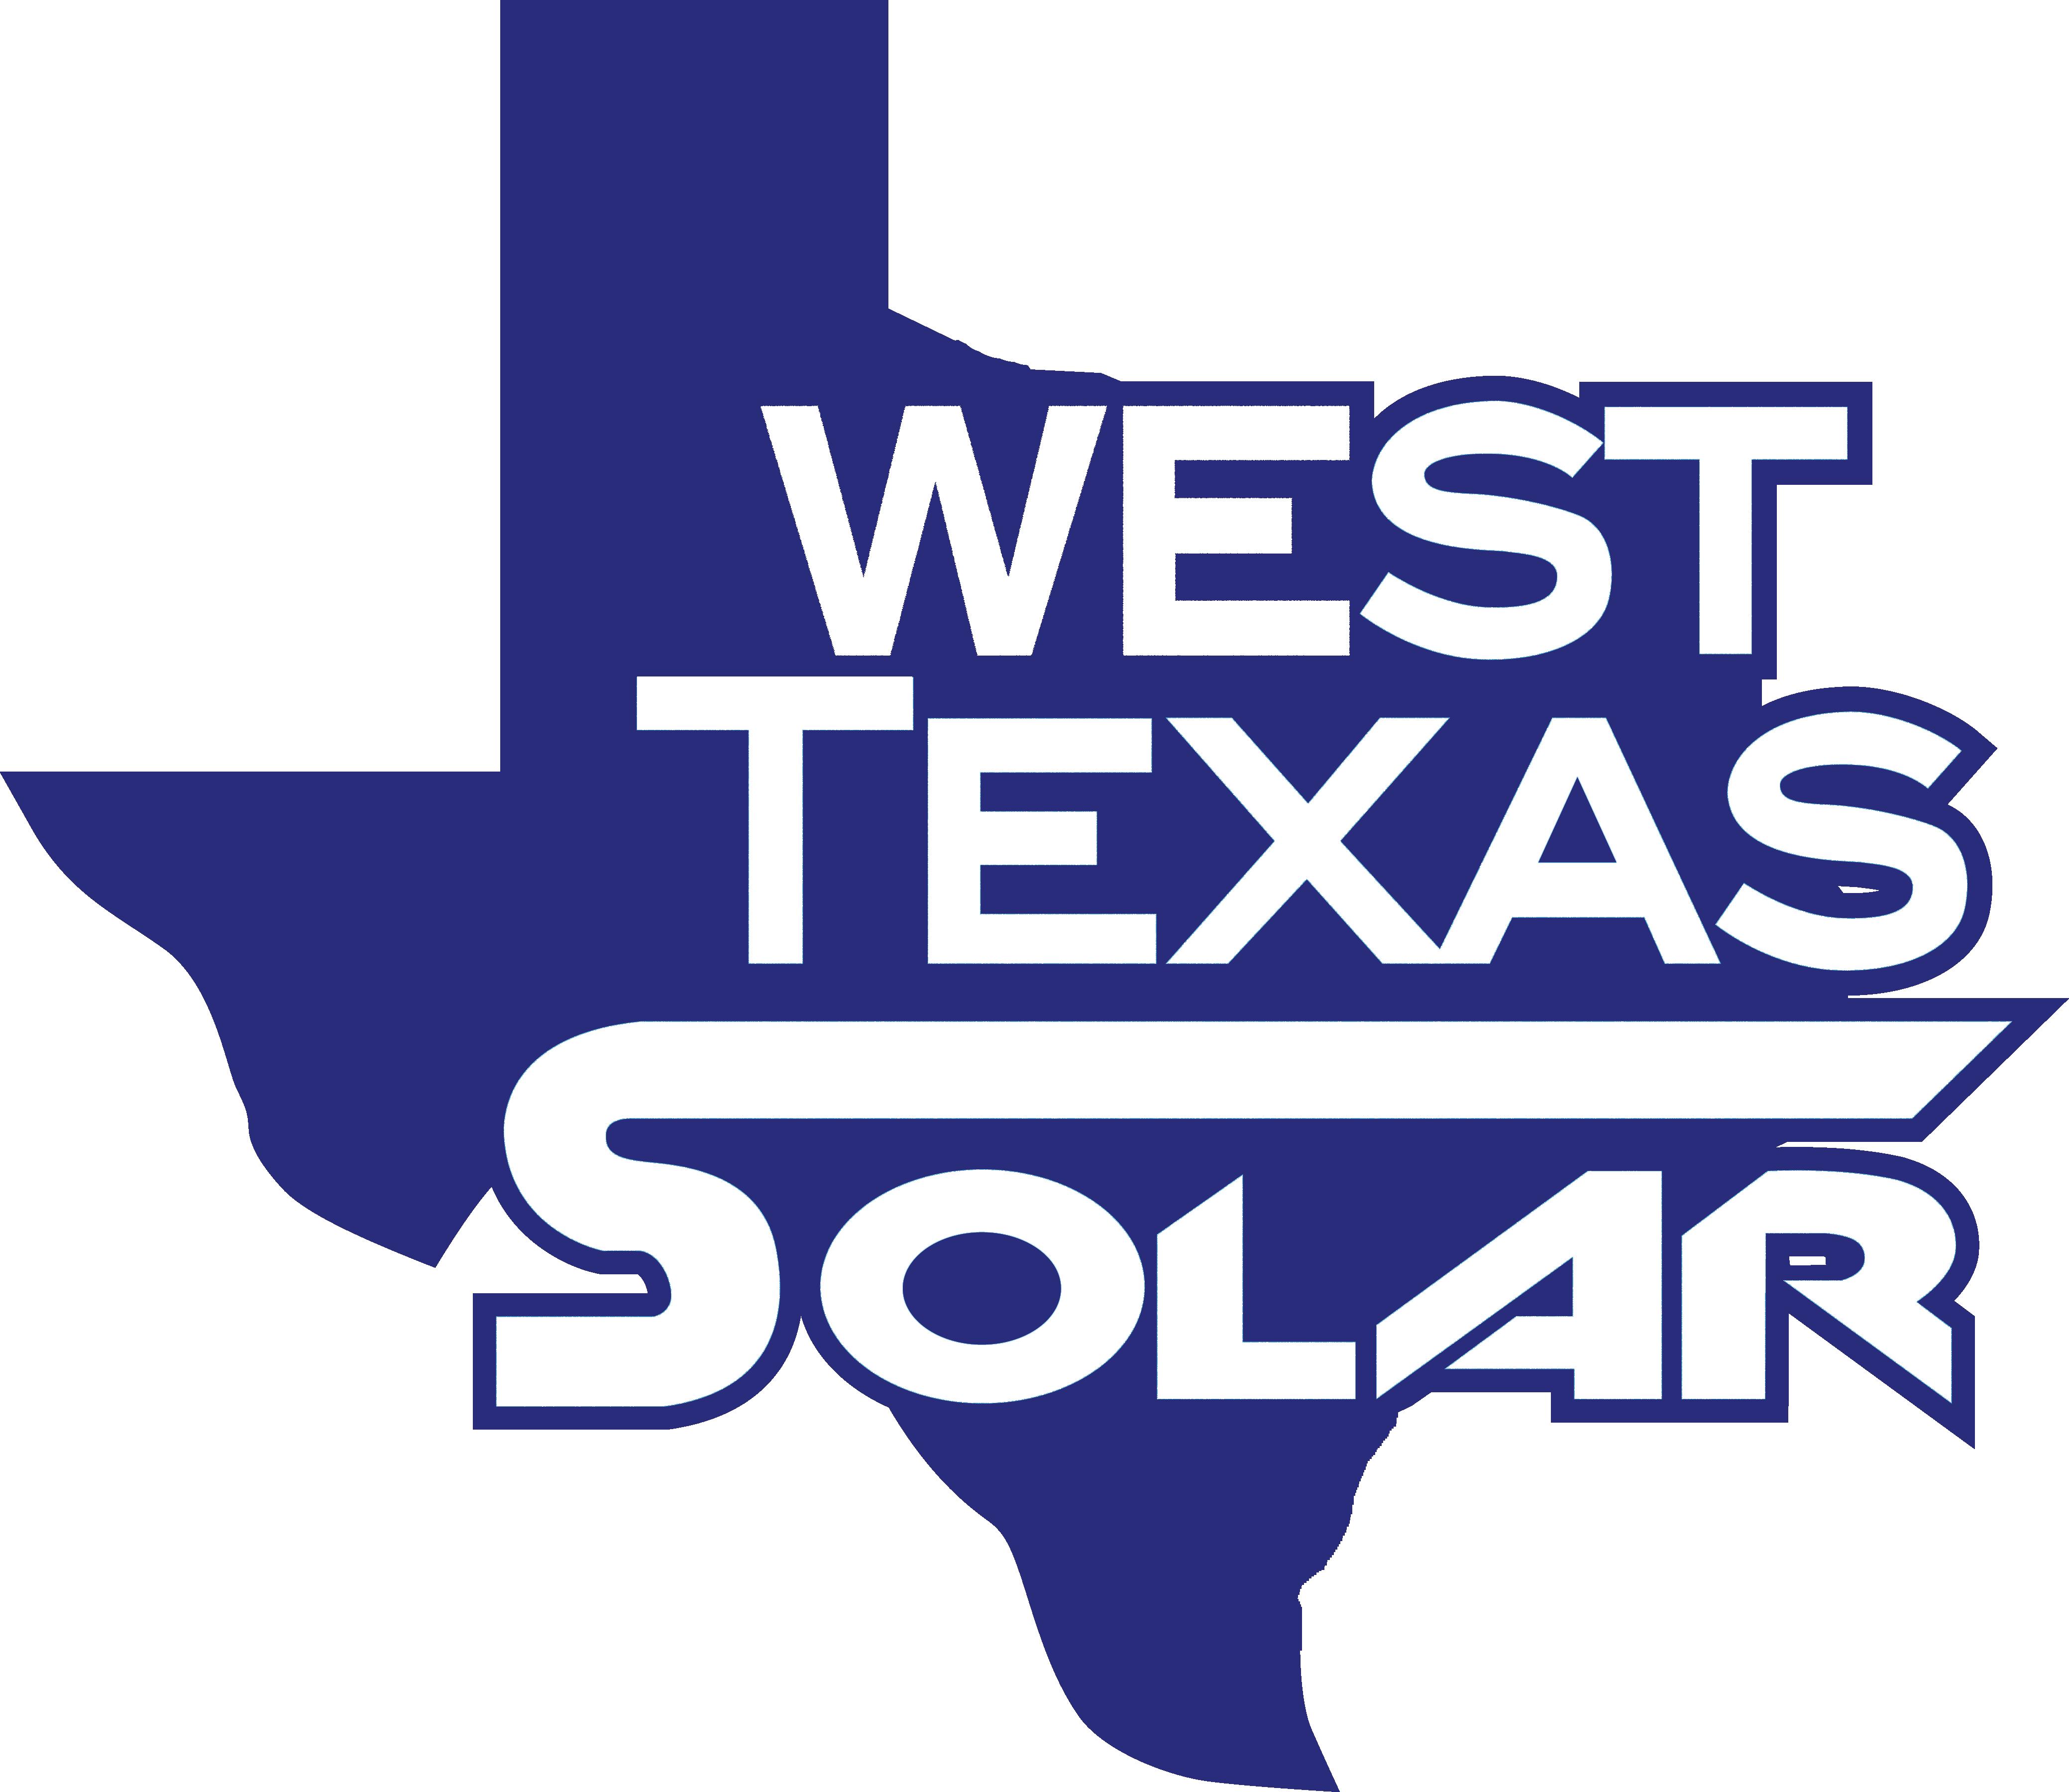 Vivint solar reviews california - West Texas Solar